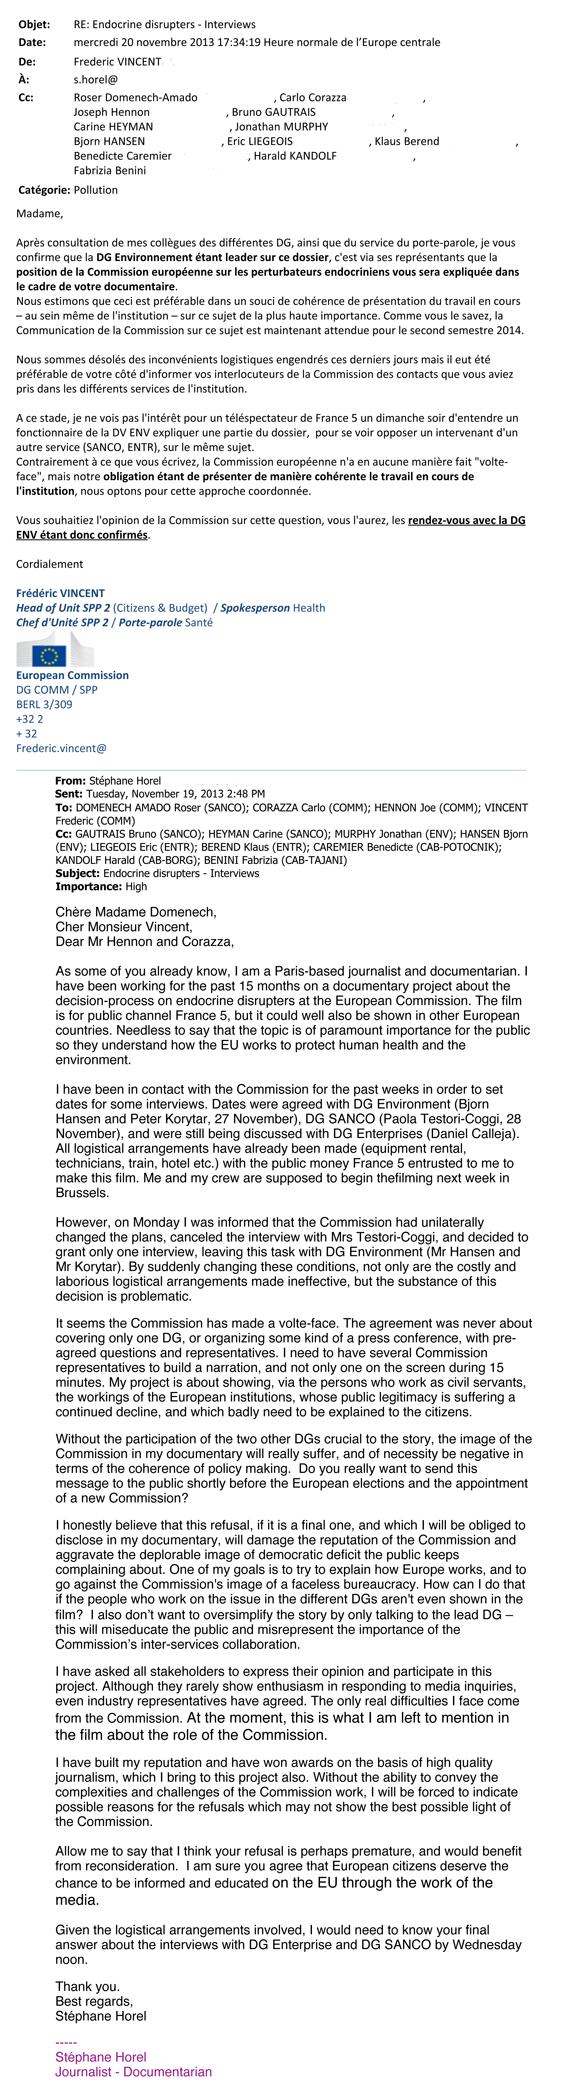 2014-08-06-2014.08.06MailDGSANCO3_1.jpg